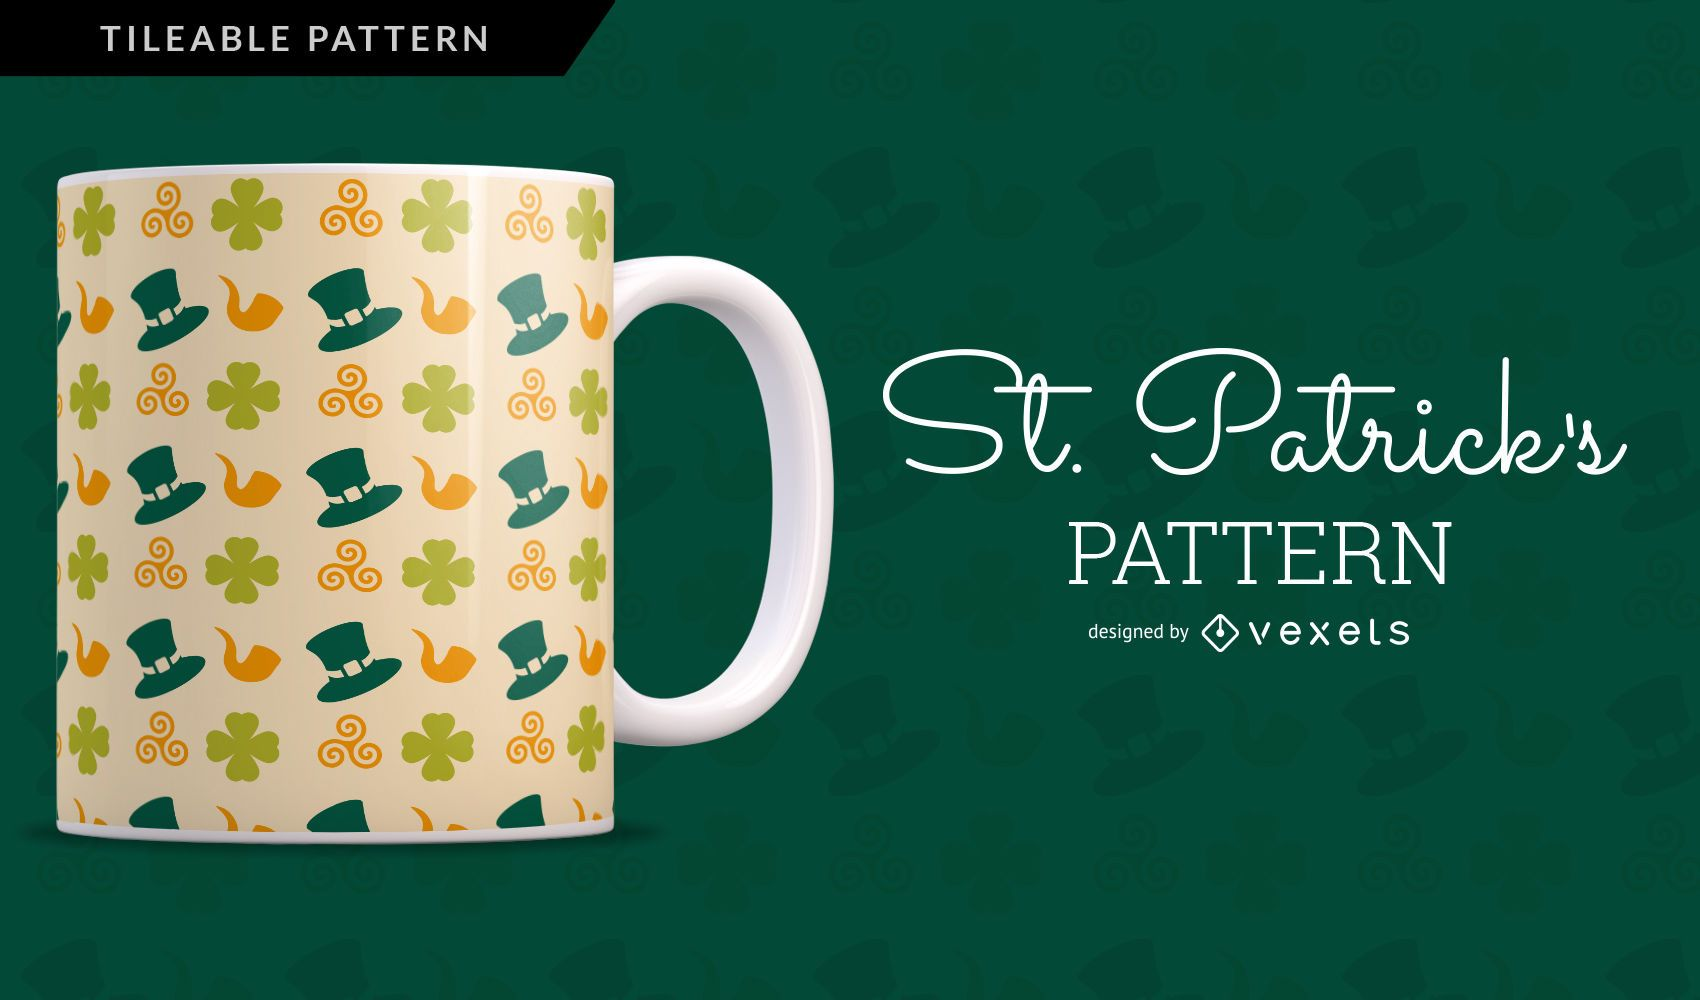 Saint Patrick's Pattern Design